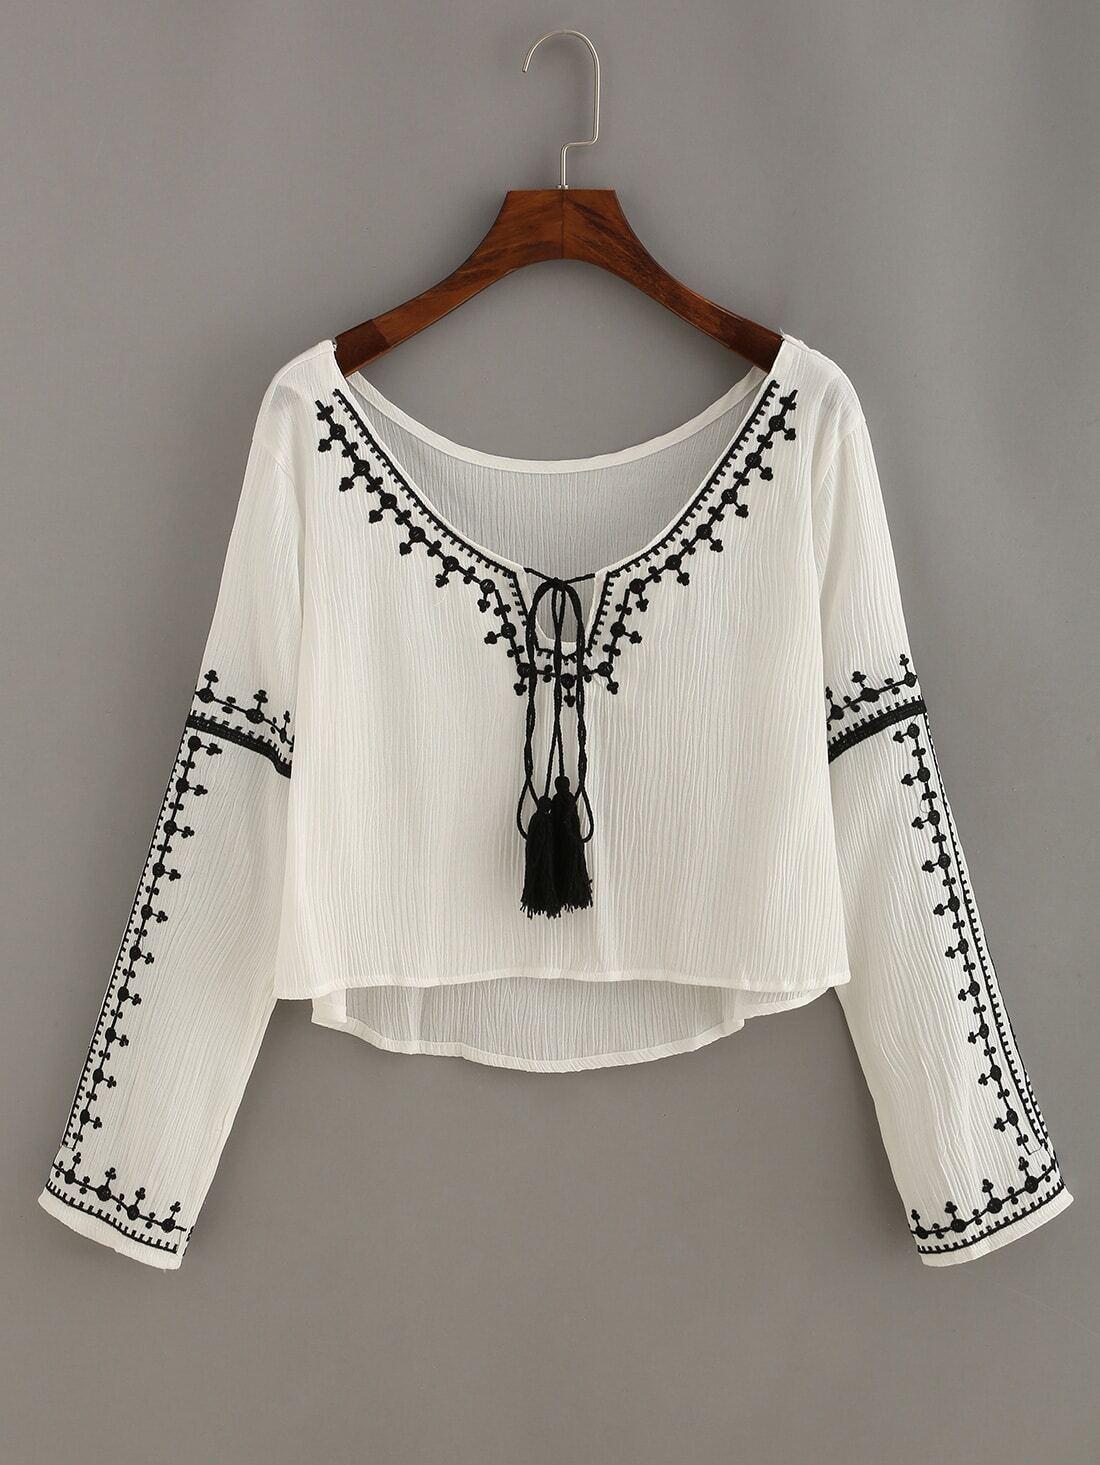 Embroidery Tassel-Tie Neck High Low Blouse -SheIn(Sheinside)